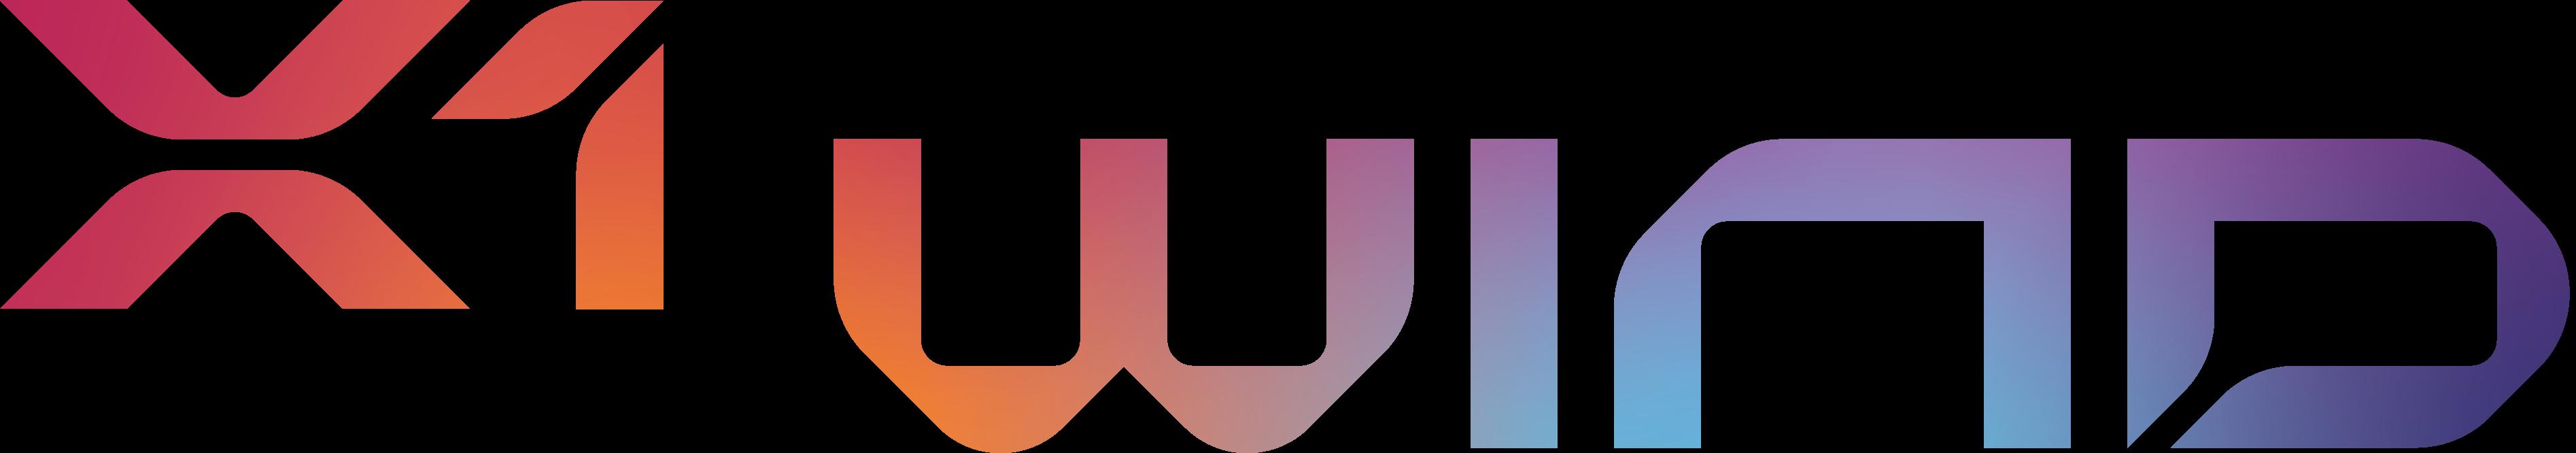 X1 Wind logo